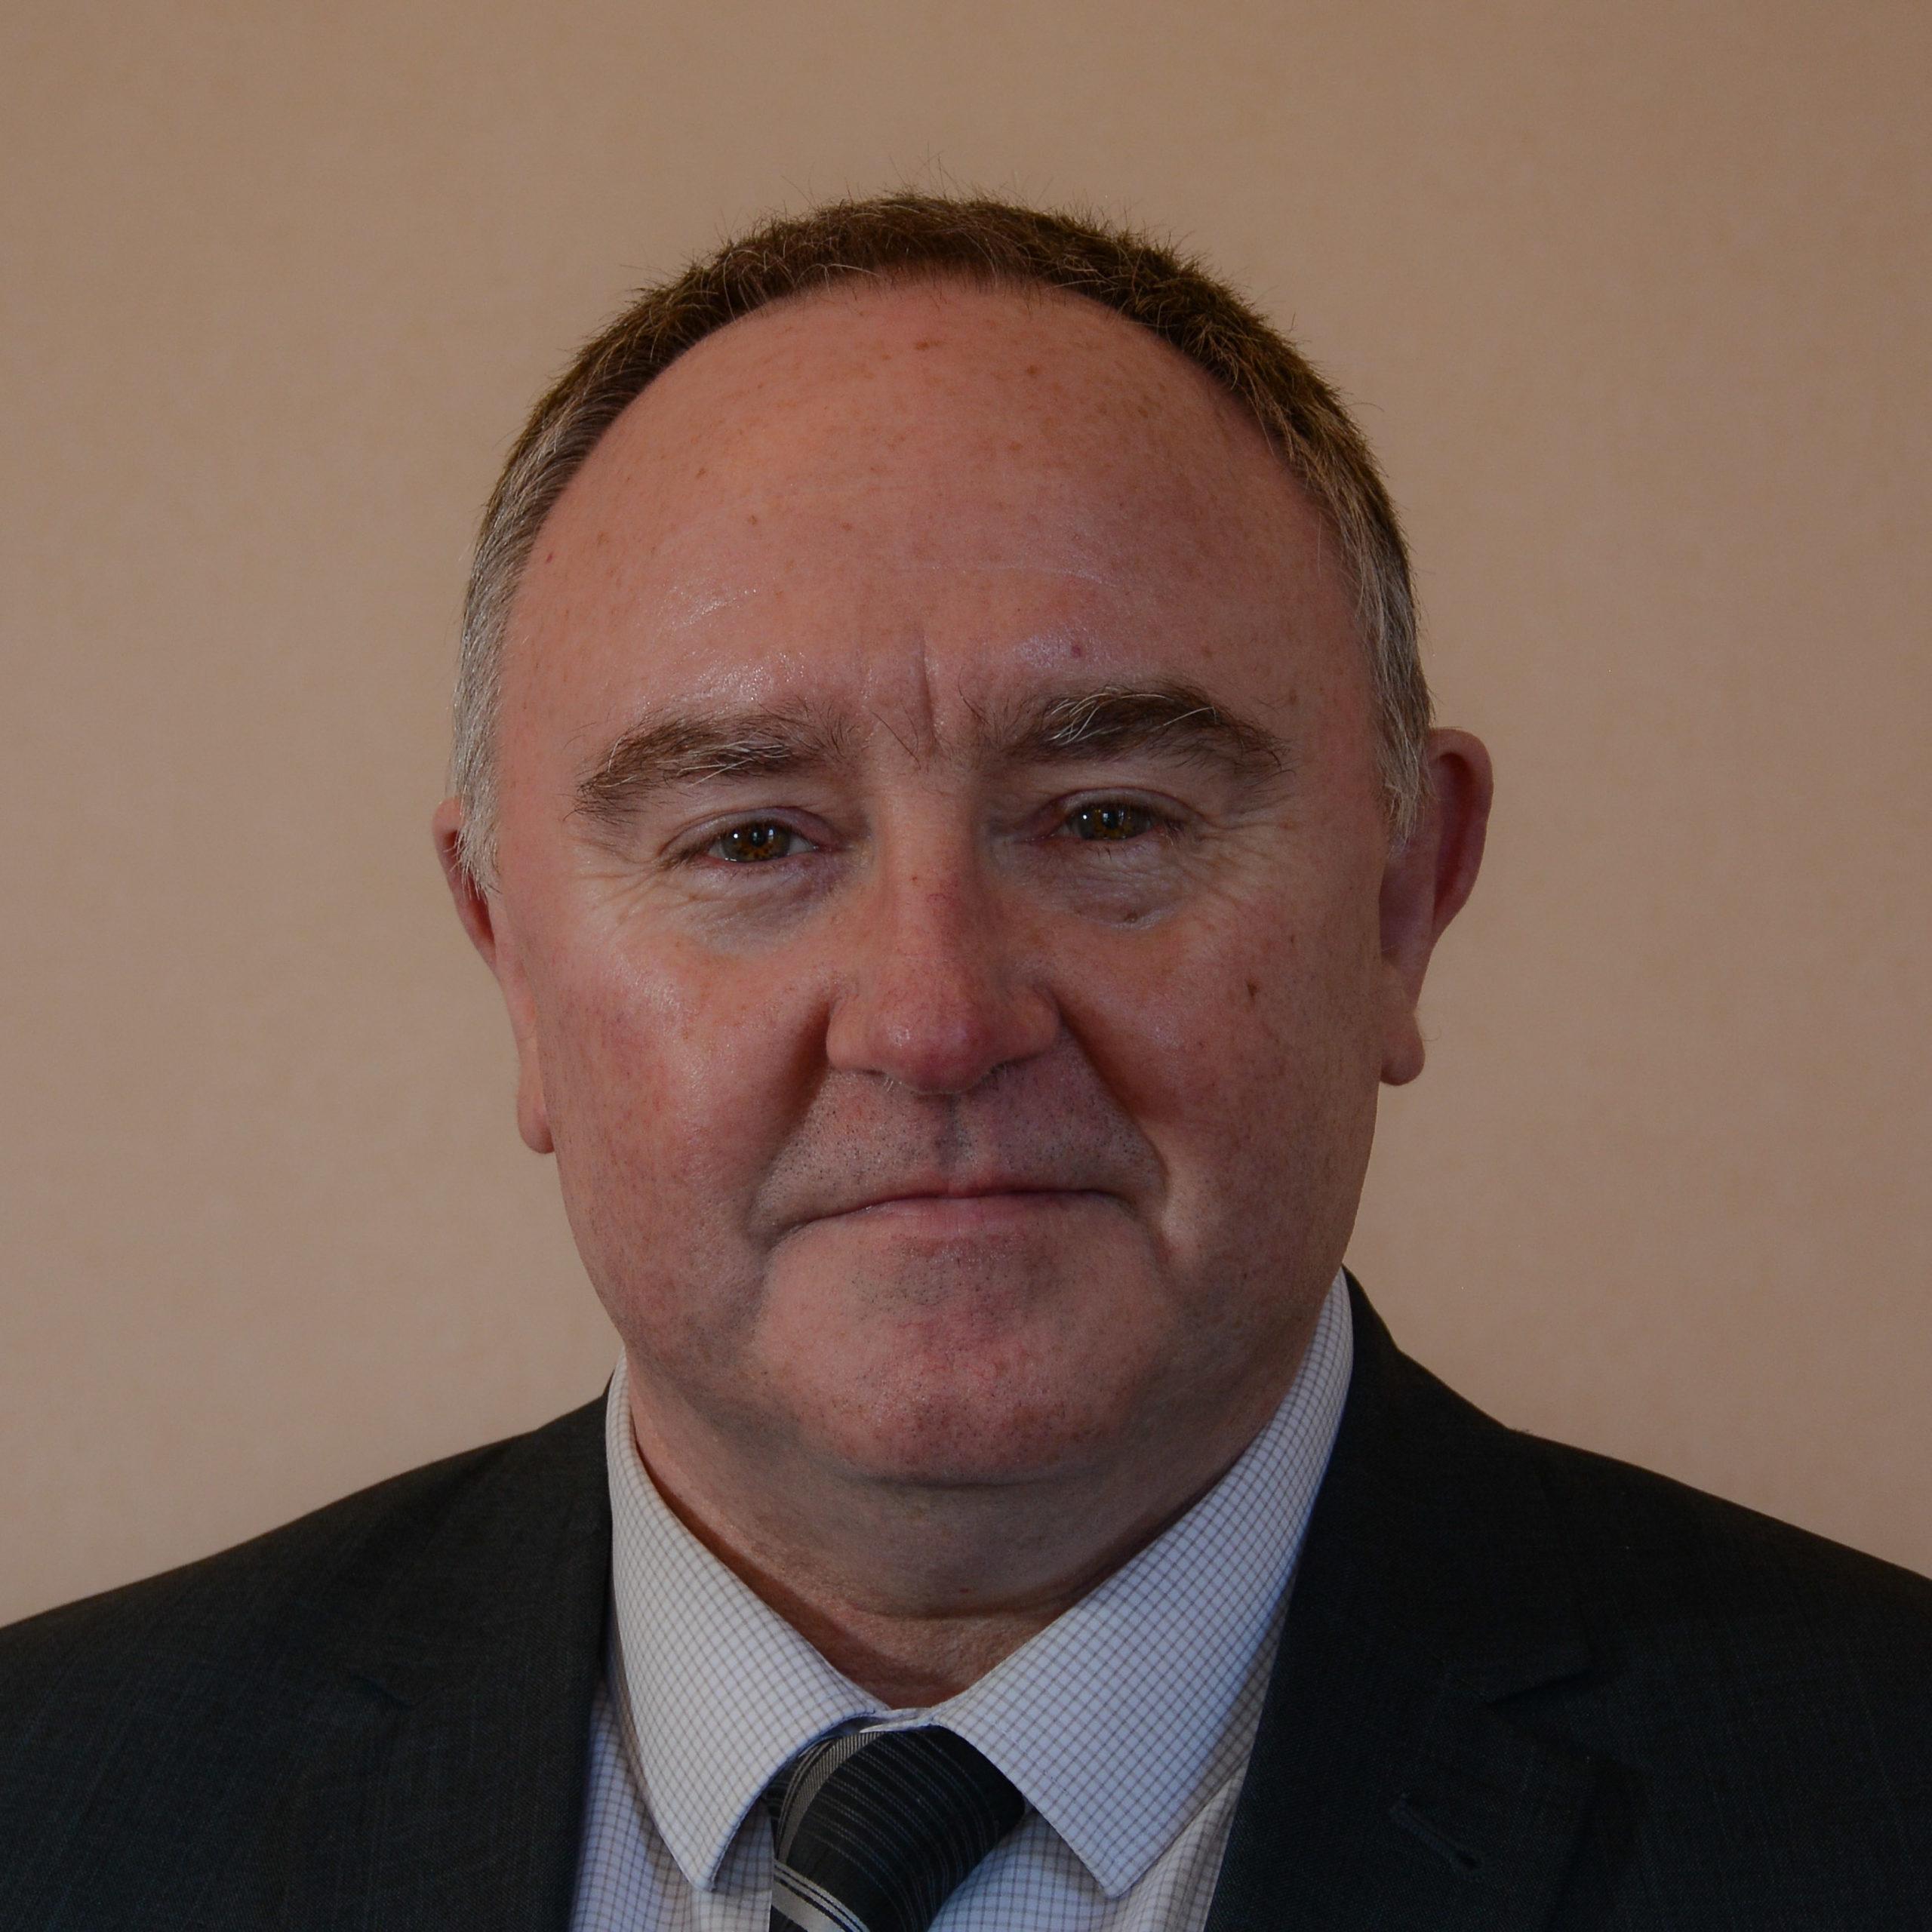 An image ofGary Davies